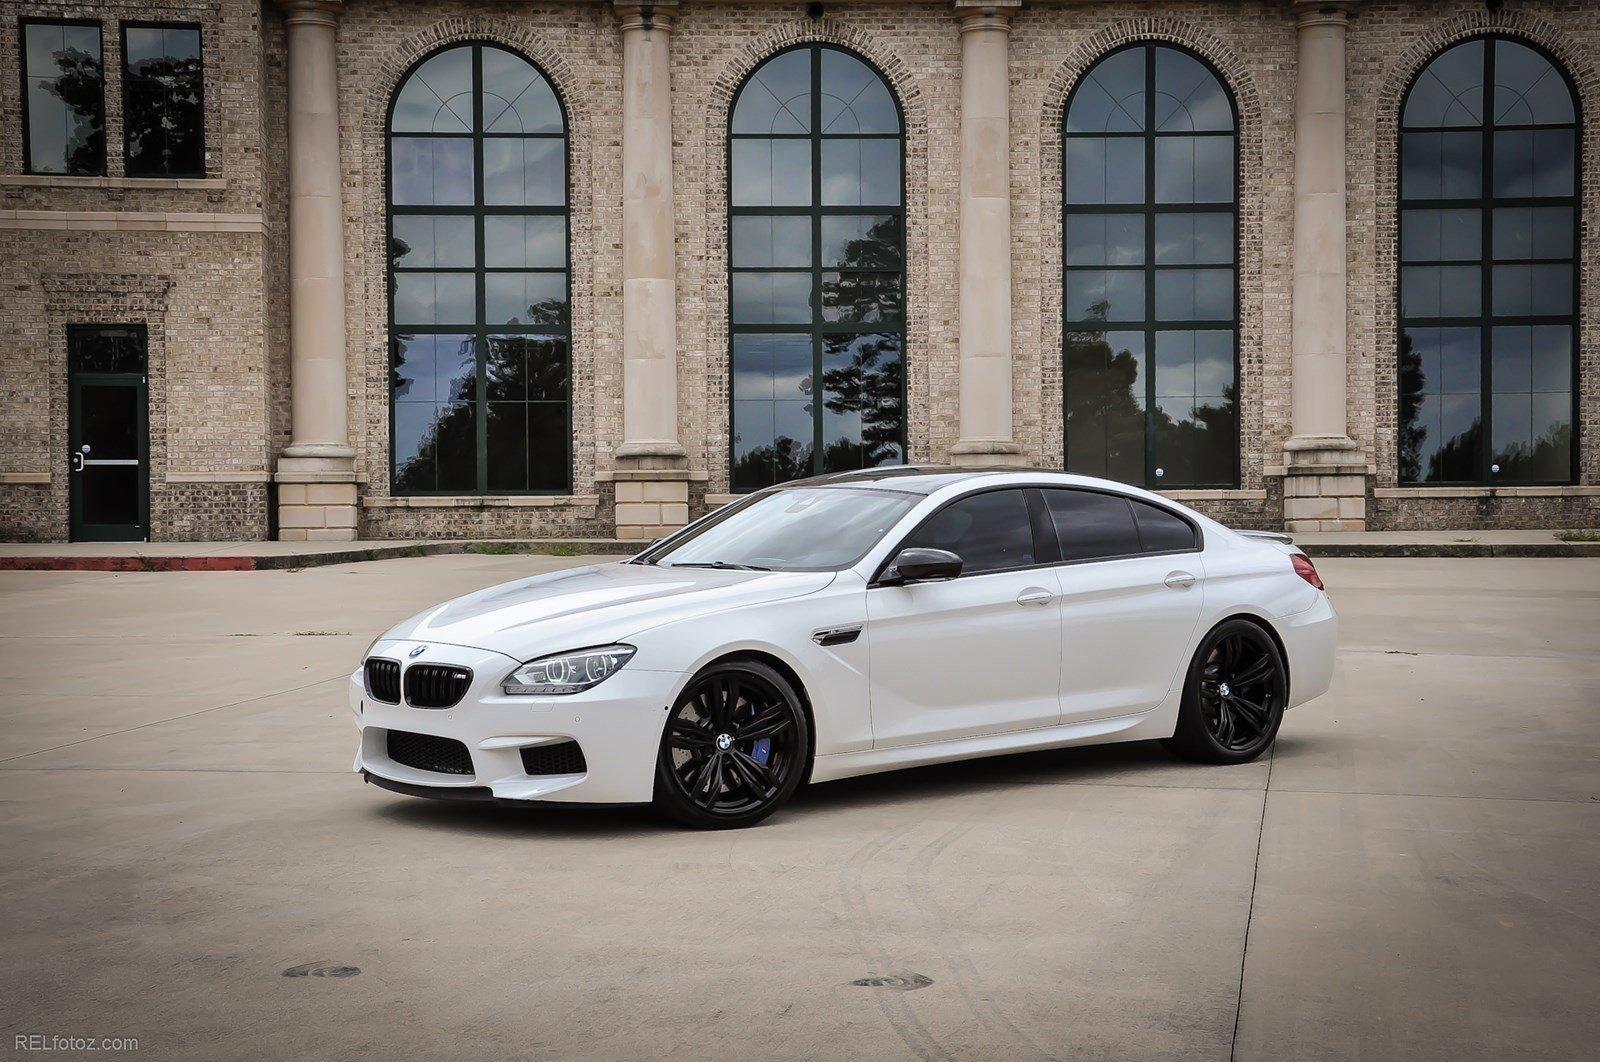 Used 2014 Bmw M6 Gran Coupe For Sale 49 999 Atlanta Autos Stock 466768 In 2020 Bmw M6 Luxury Car Dealership Bmw